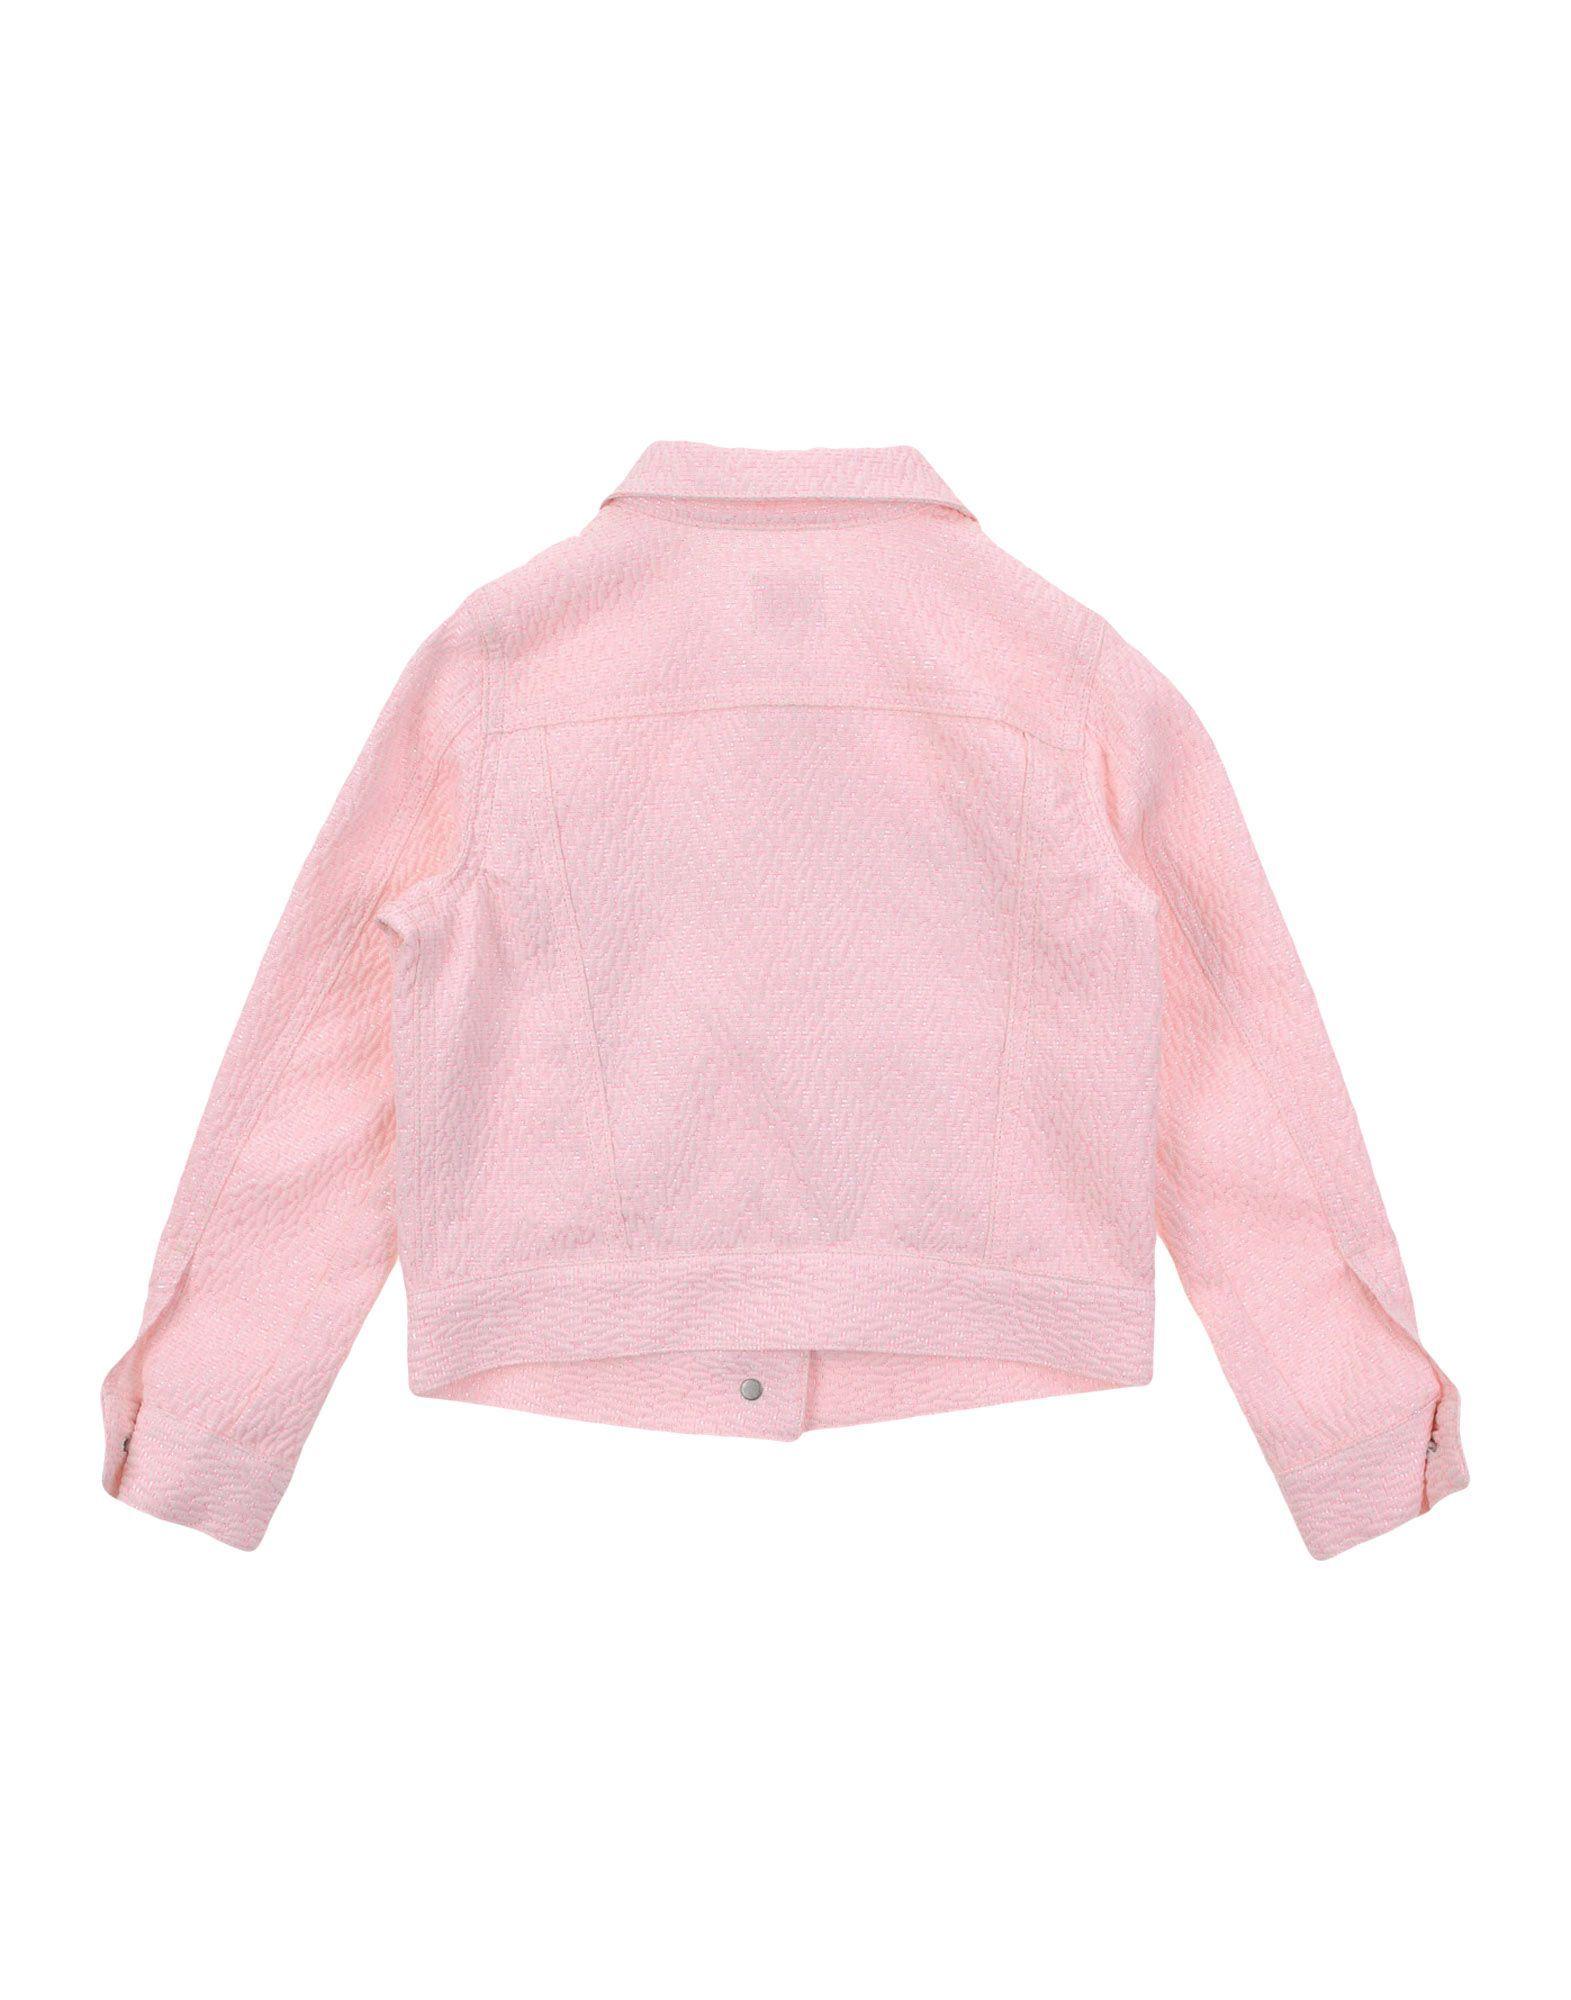 Mauro Grifoni Pink Jacket